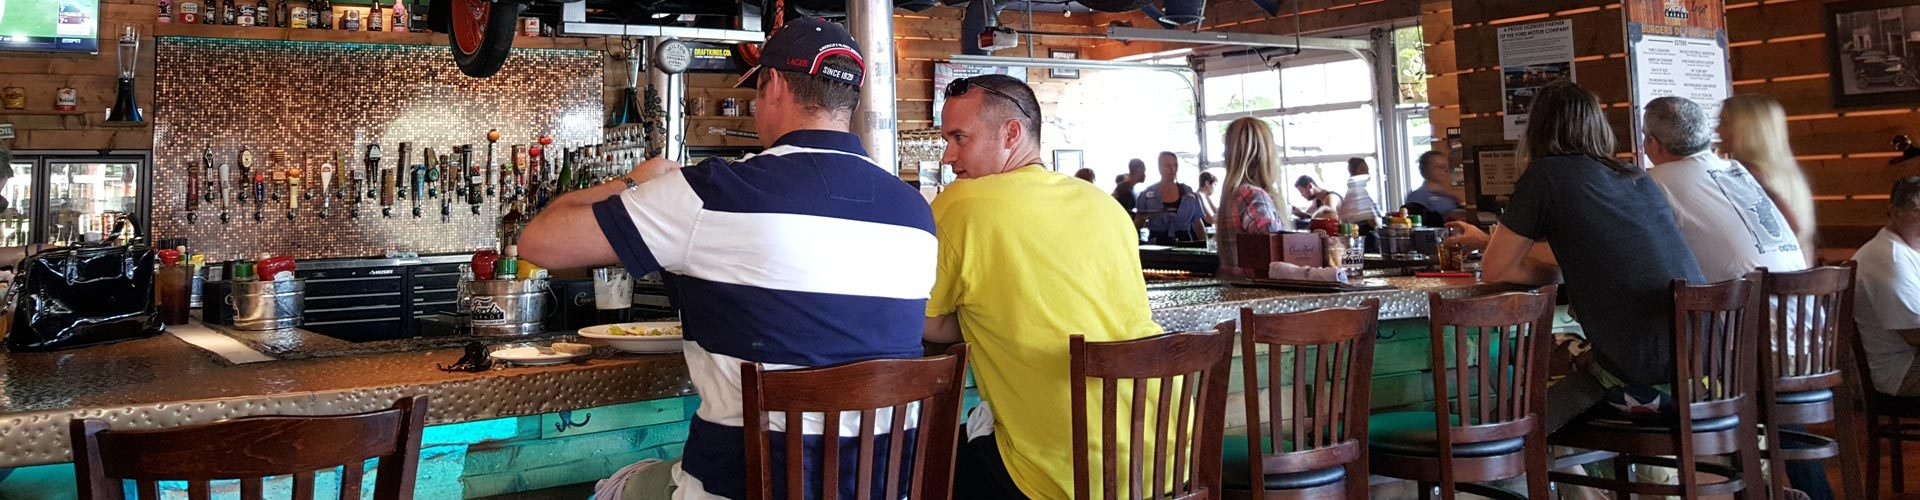 An der Bar in Fords Garage, Estero, Florida